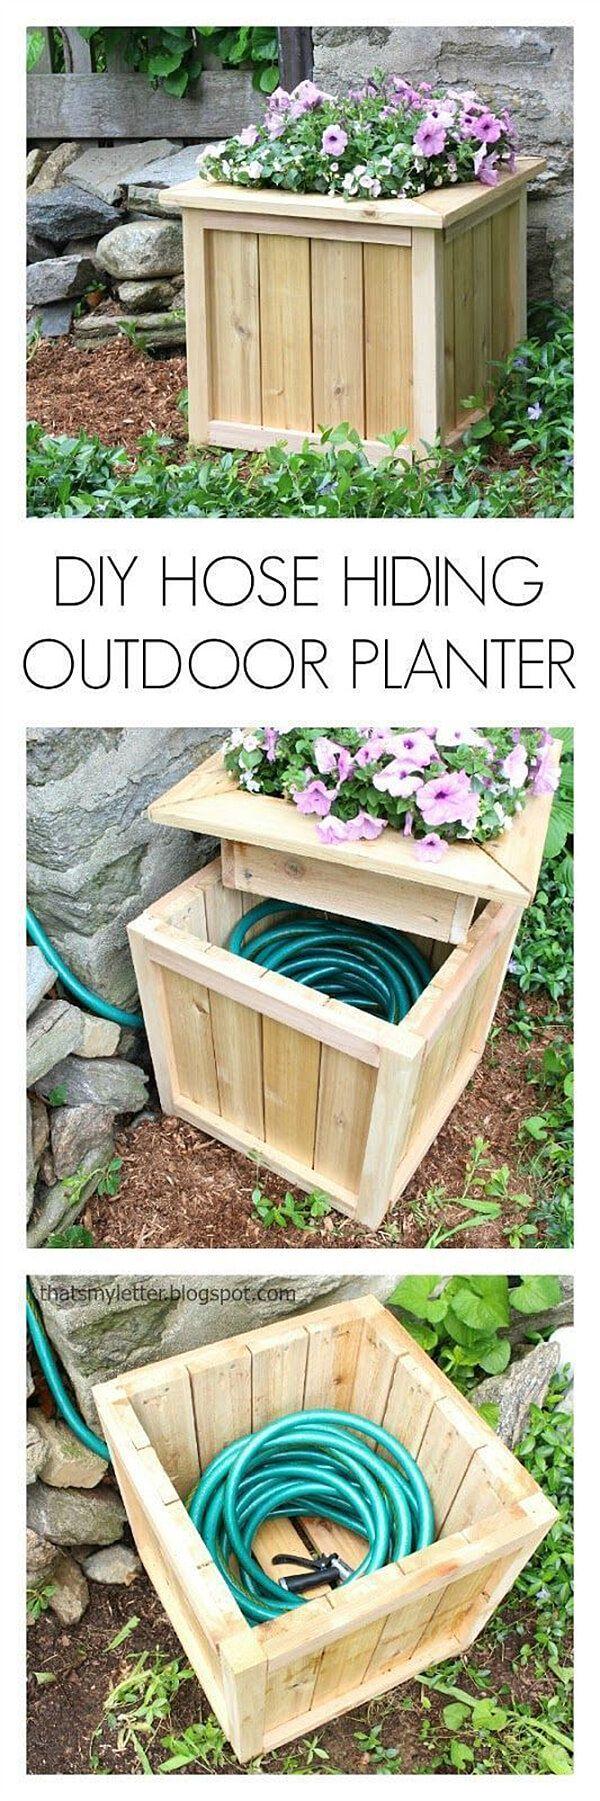 Hose Hider Outdoor Planter Box